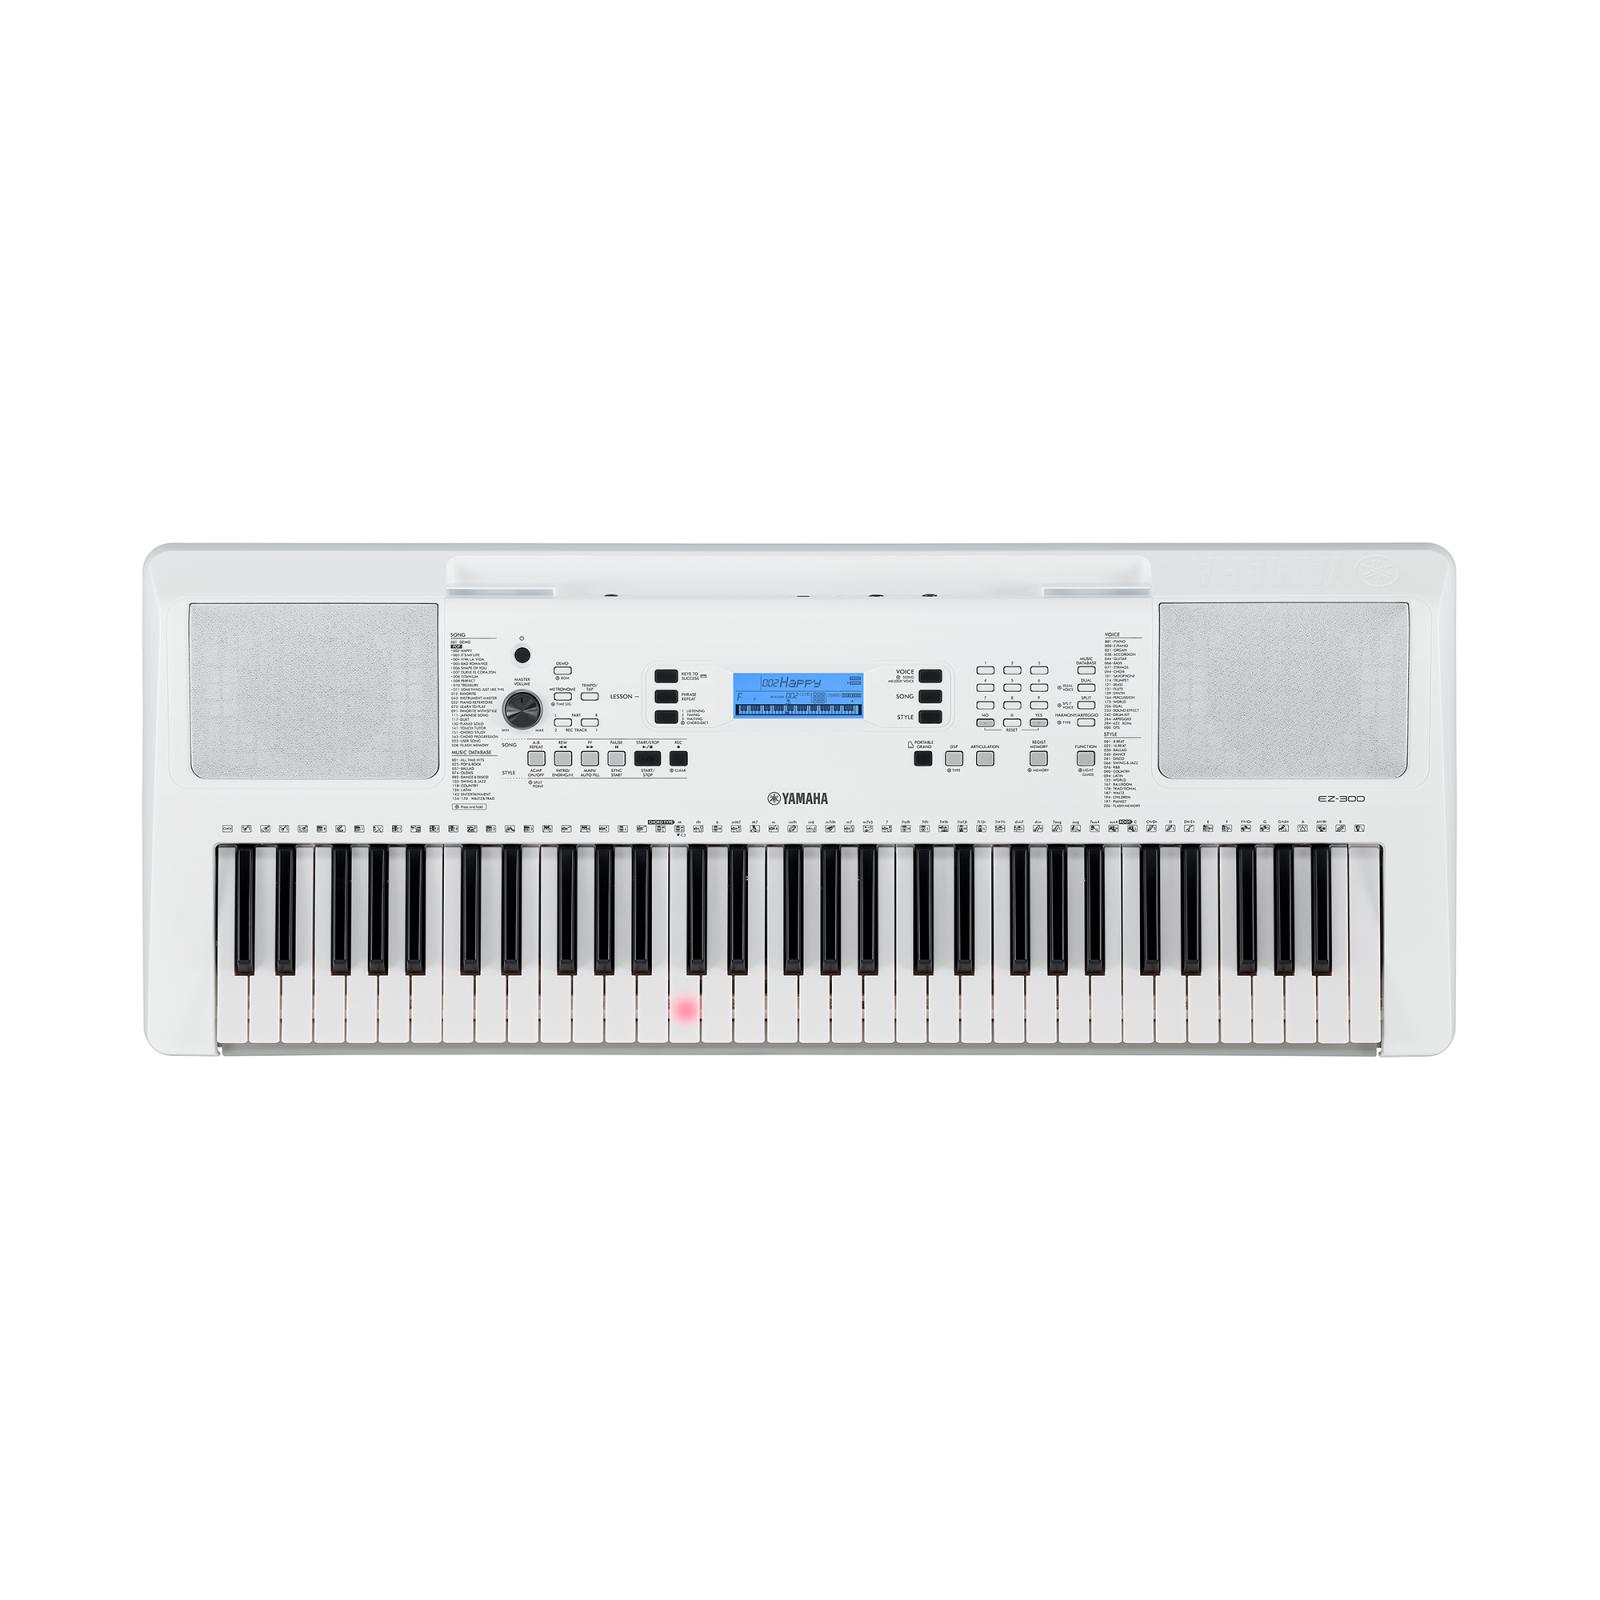 Yamaha EZ300 Groove Zone Portable Keyboard With Light Up Keys